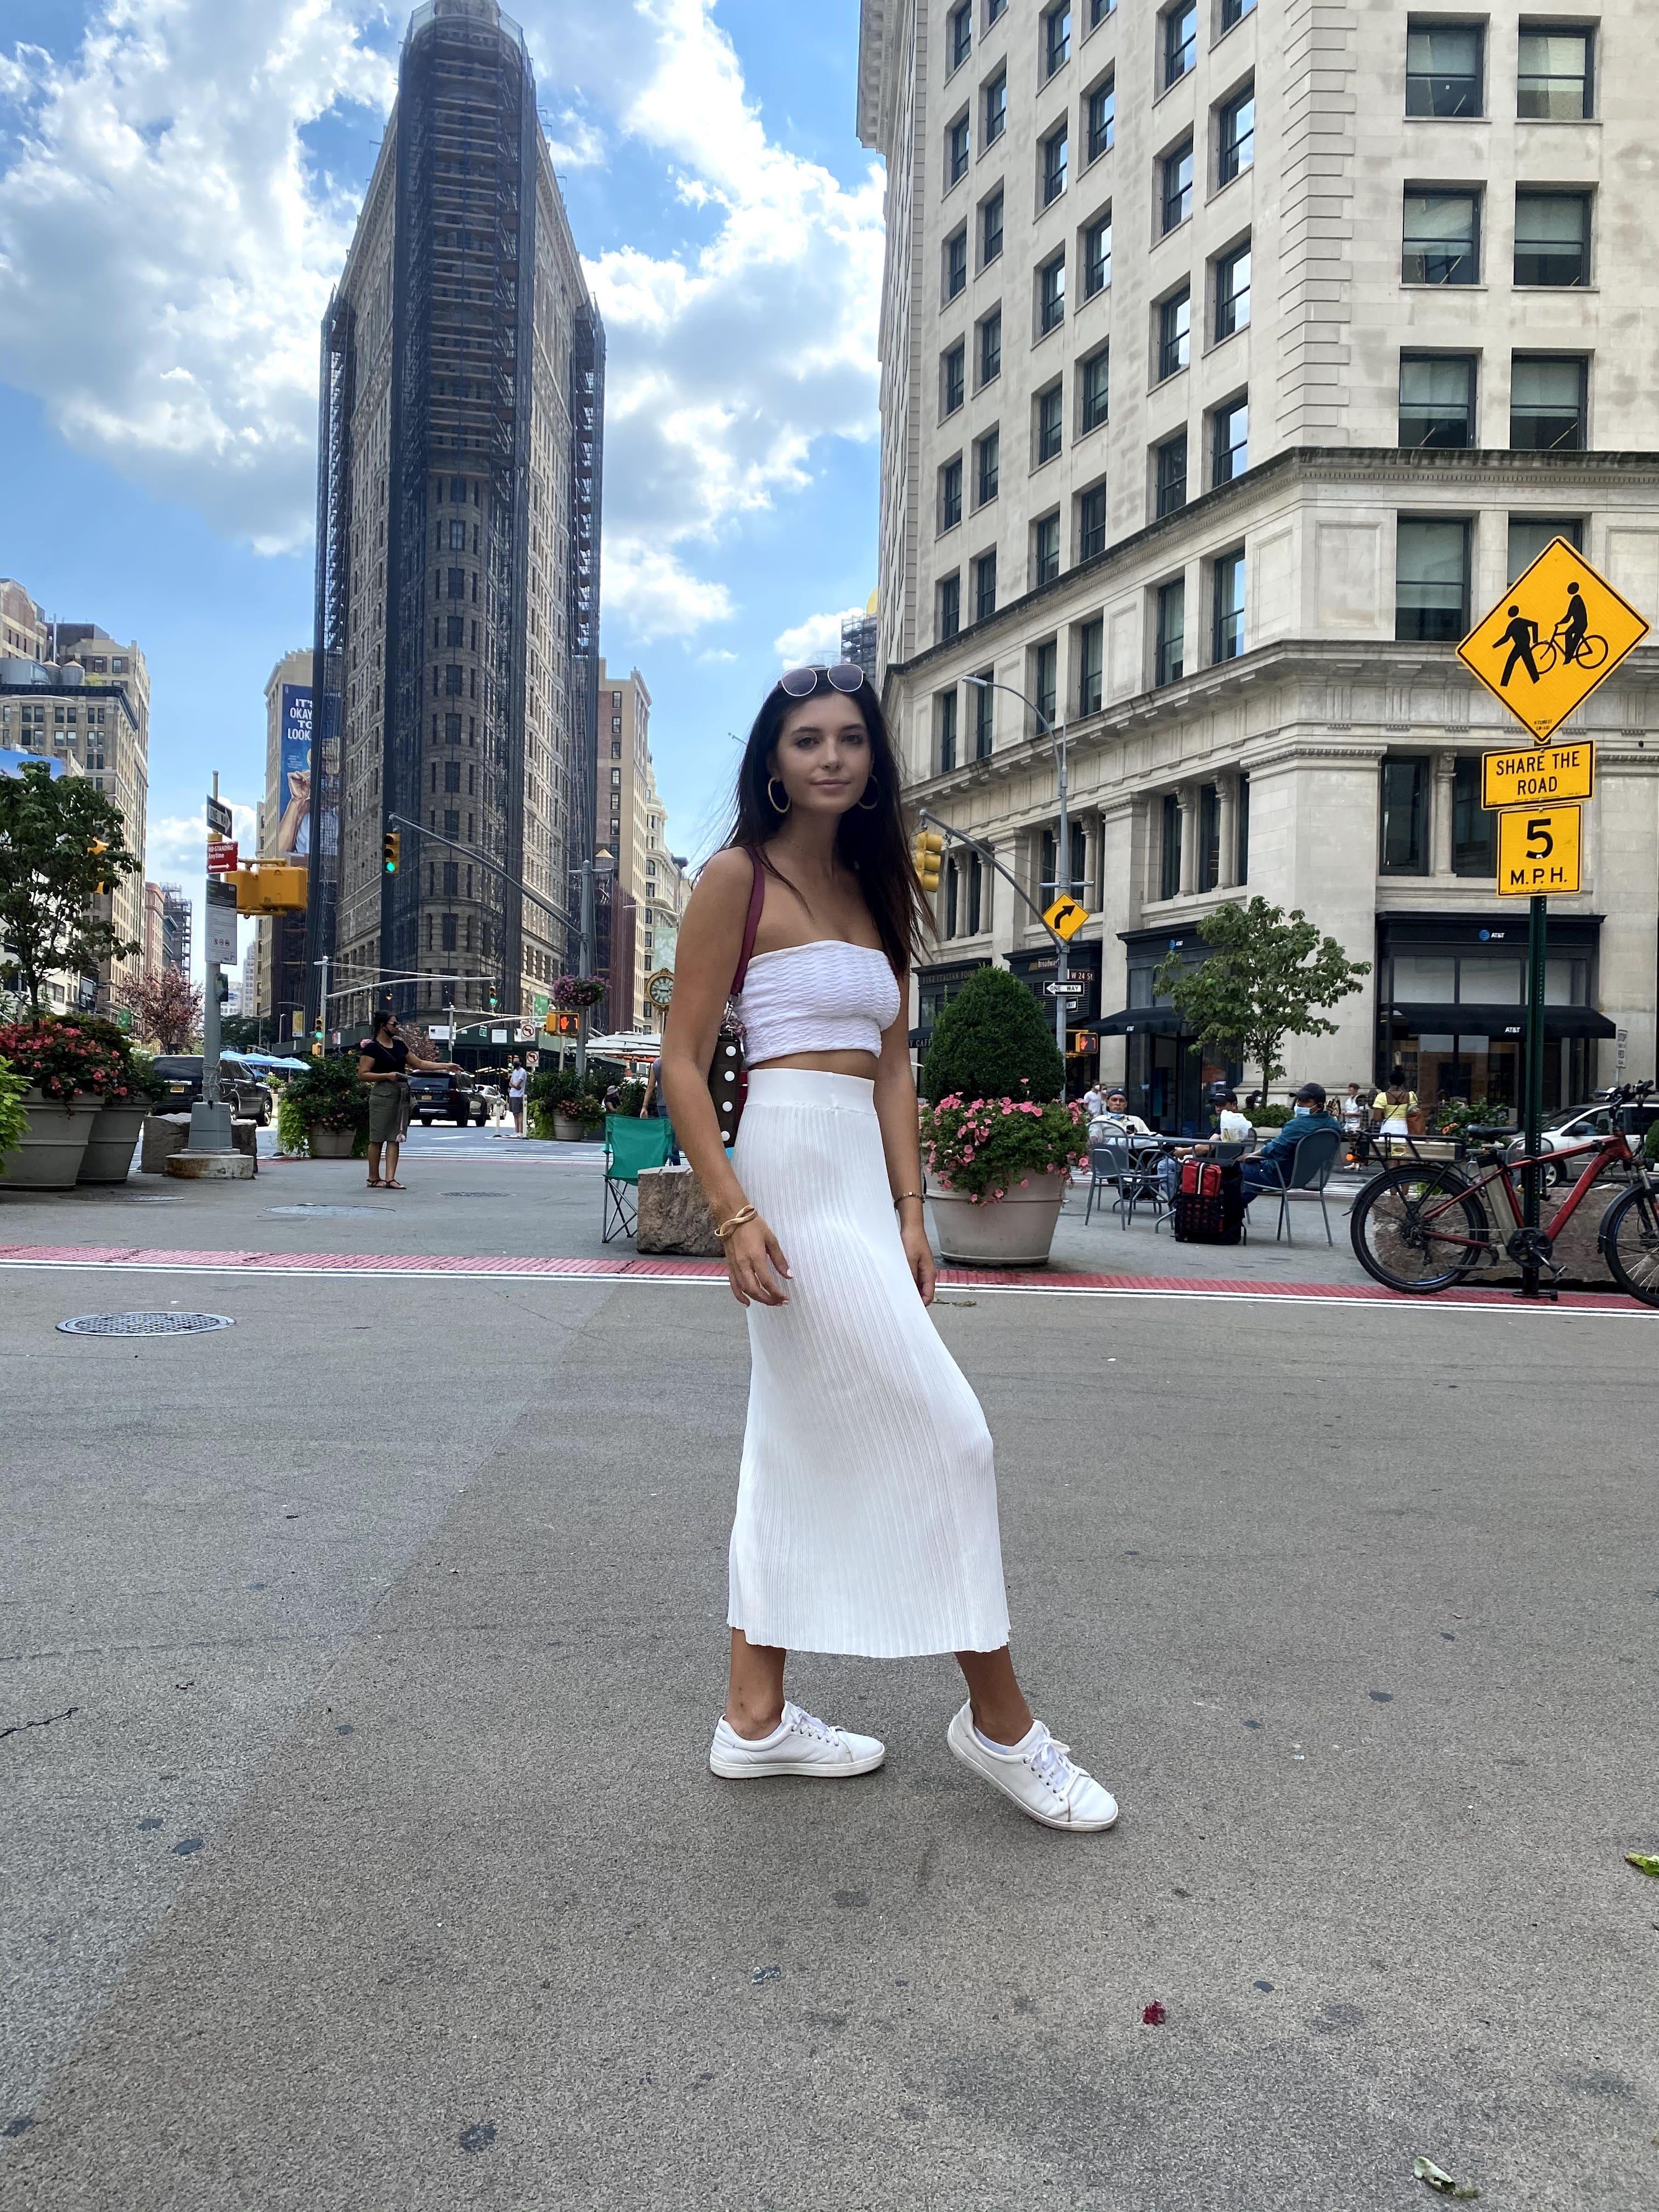 Kelly Hooper in New York